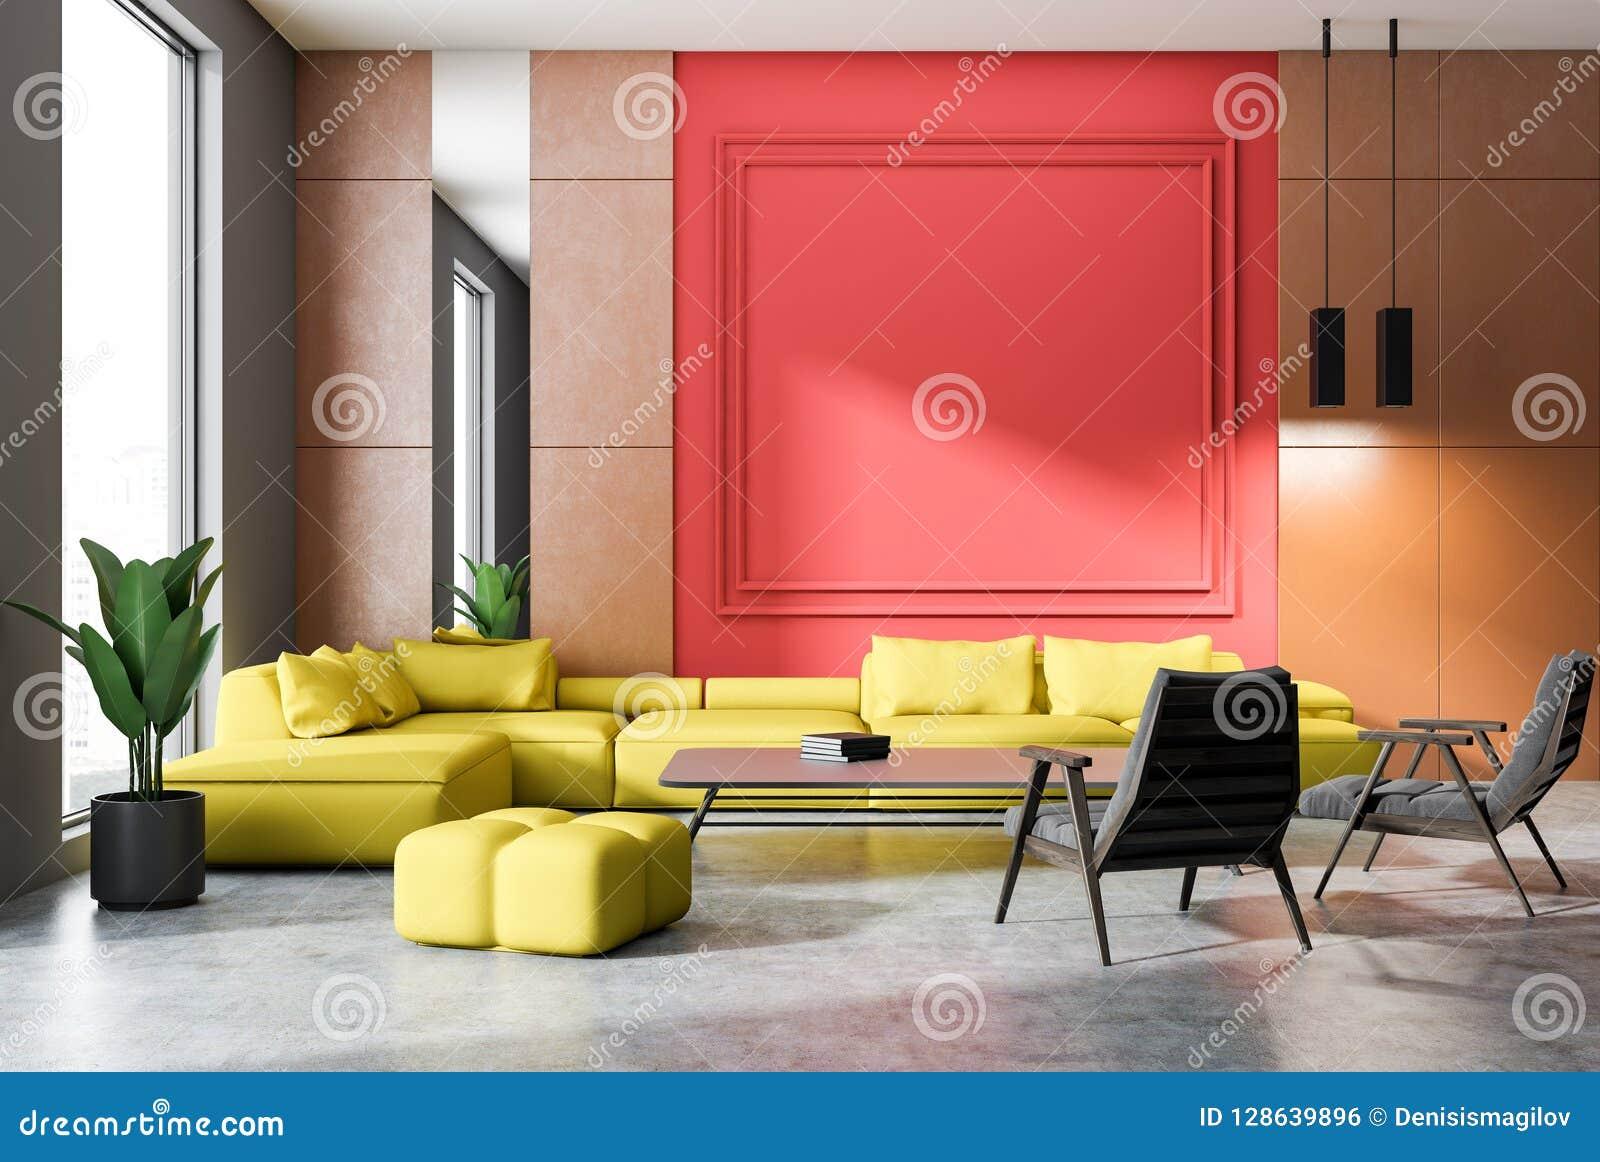 Orange And Red Living Room Yellow Sofa Stock Illustration